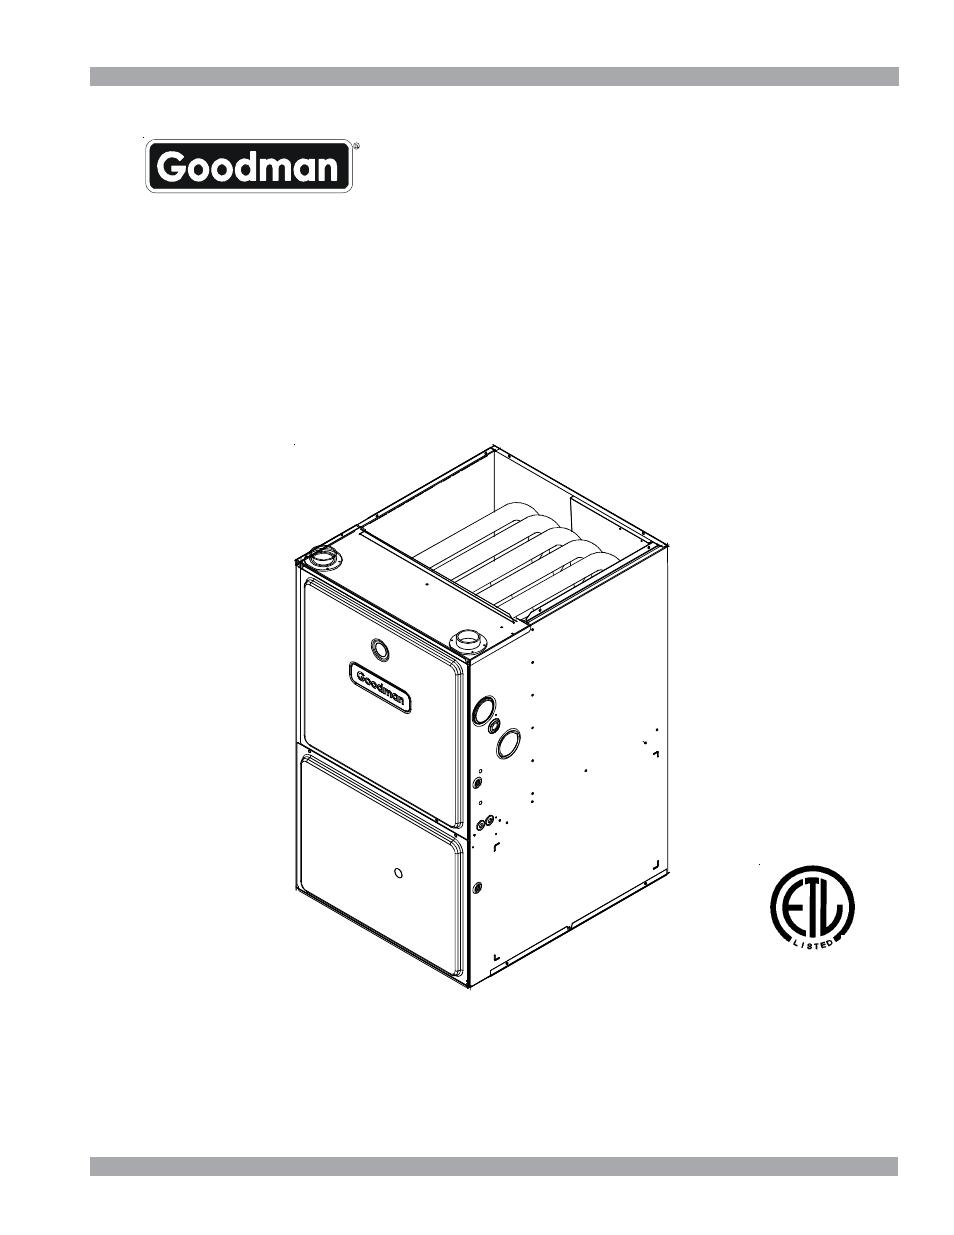 Goodman Mfg Gmh95 User Manual 15 Pages